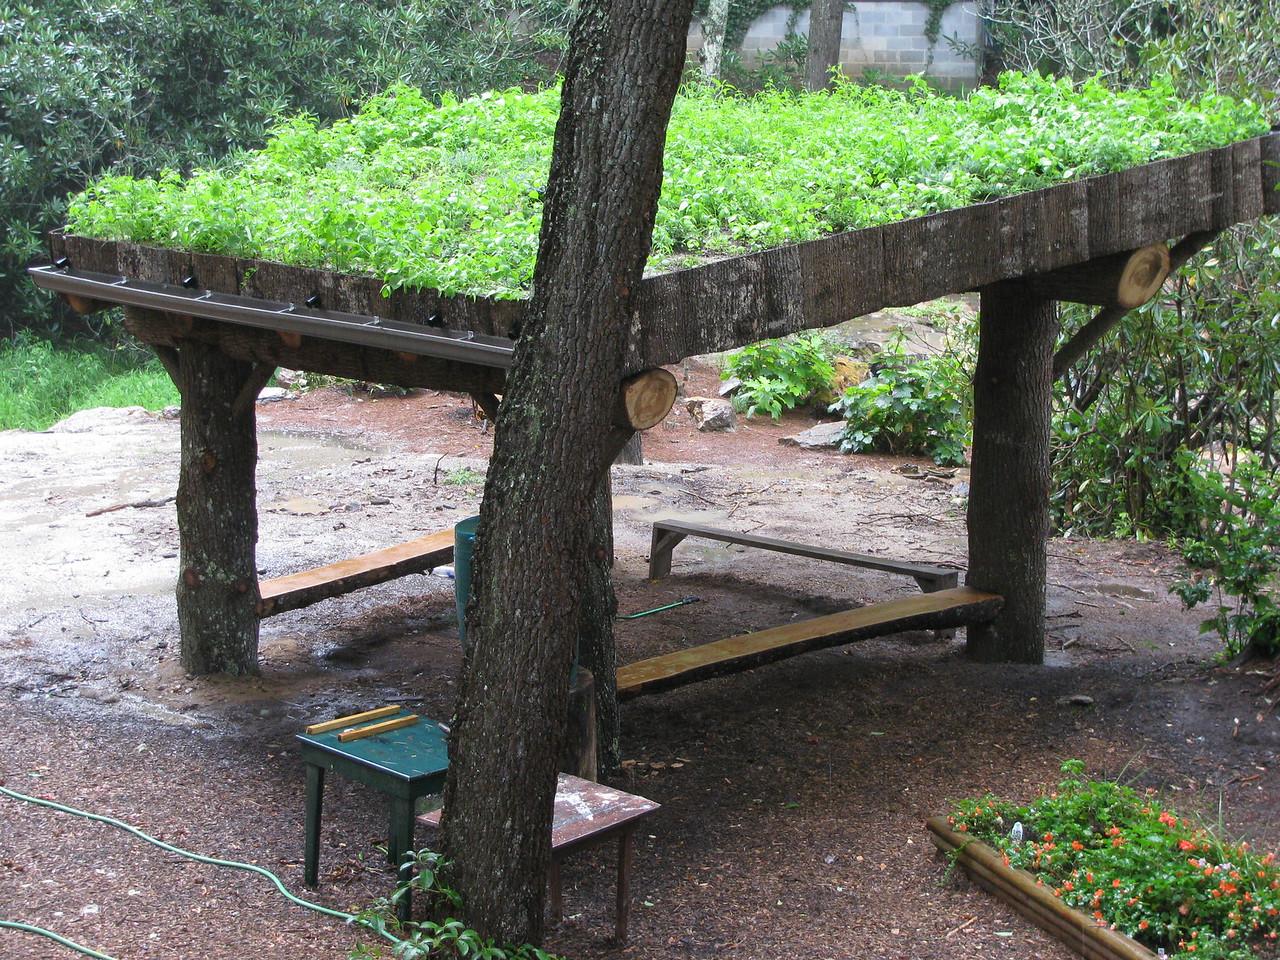 Camp Merrie-Woode Pavilion